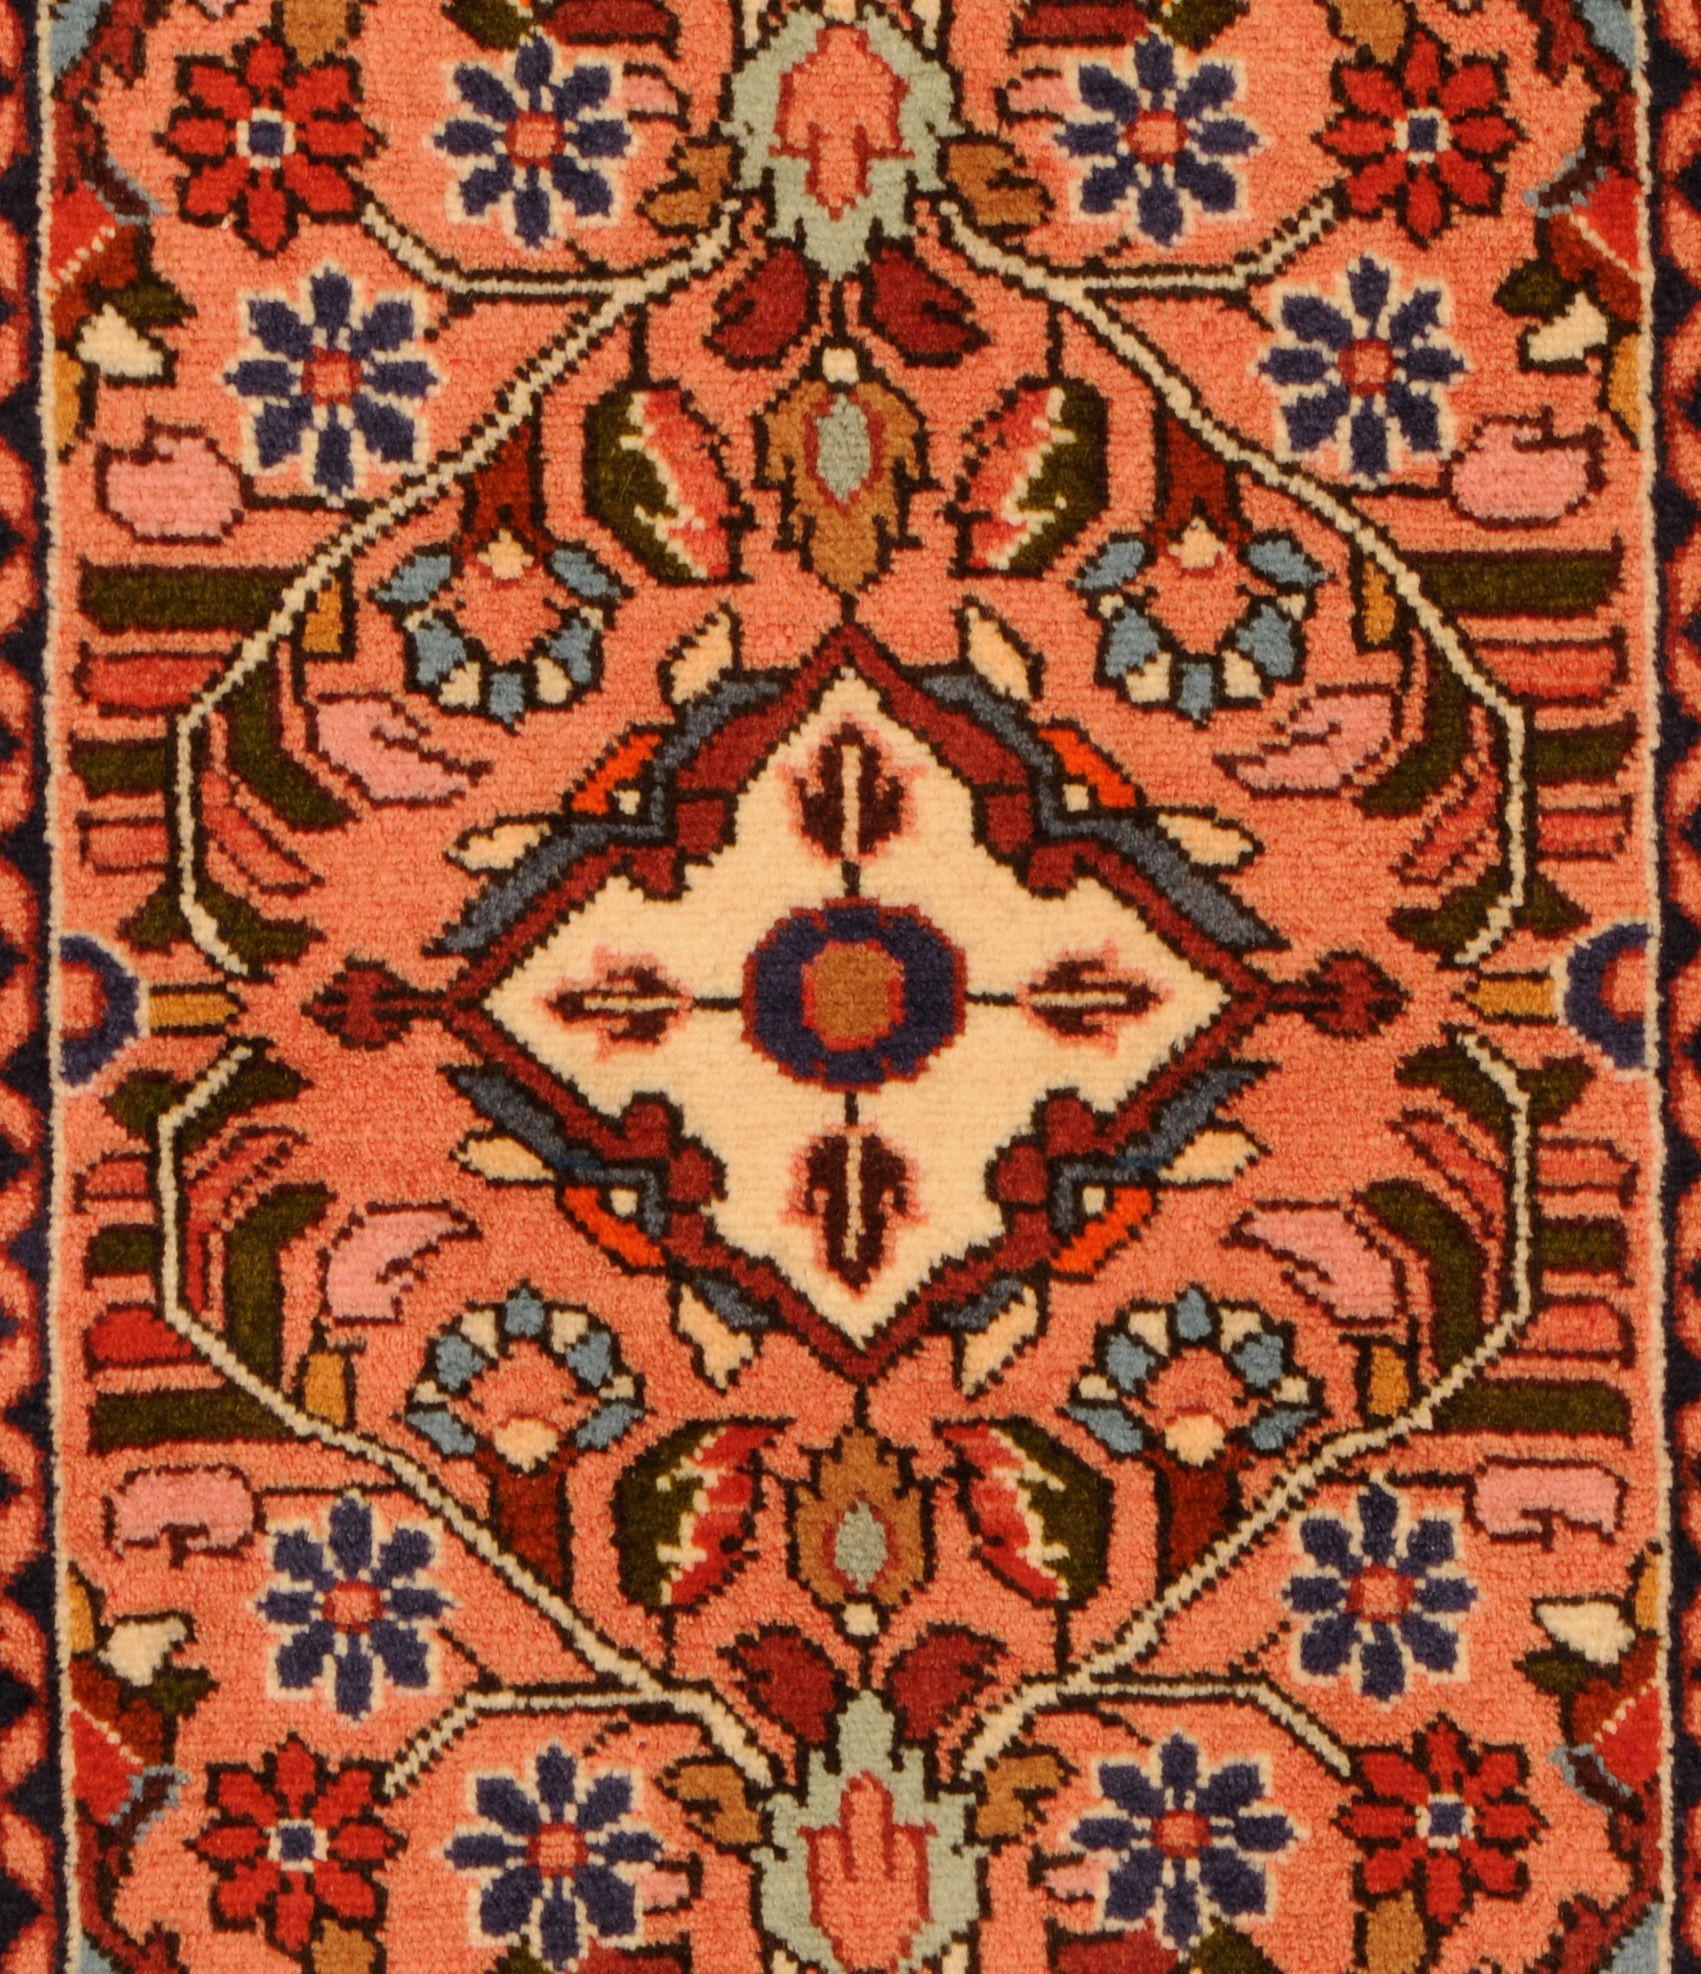 Persian Carpet Patterns Google Search Iran Pinterest